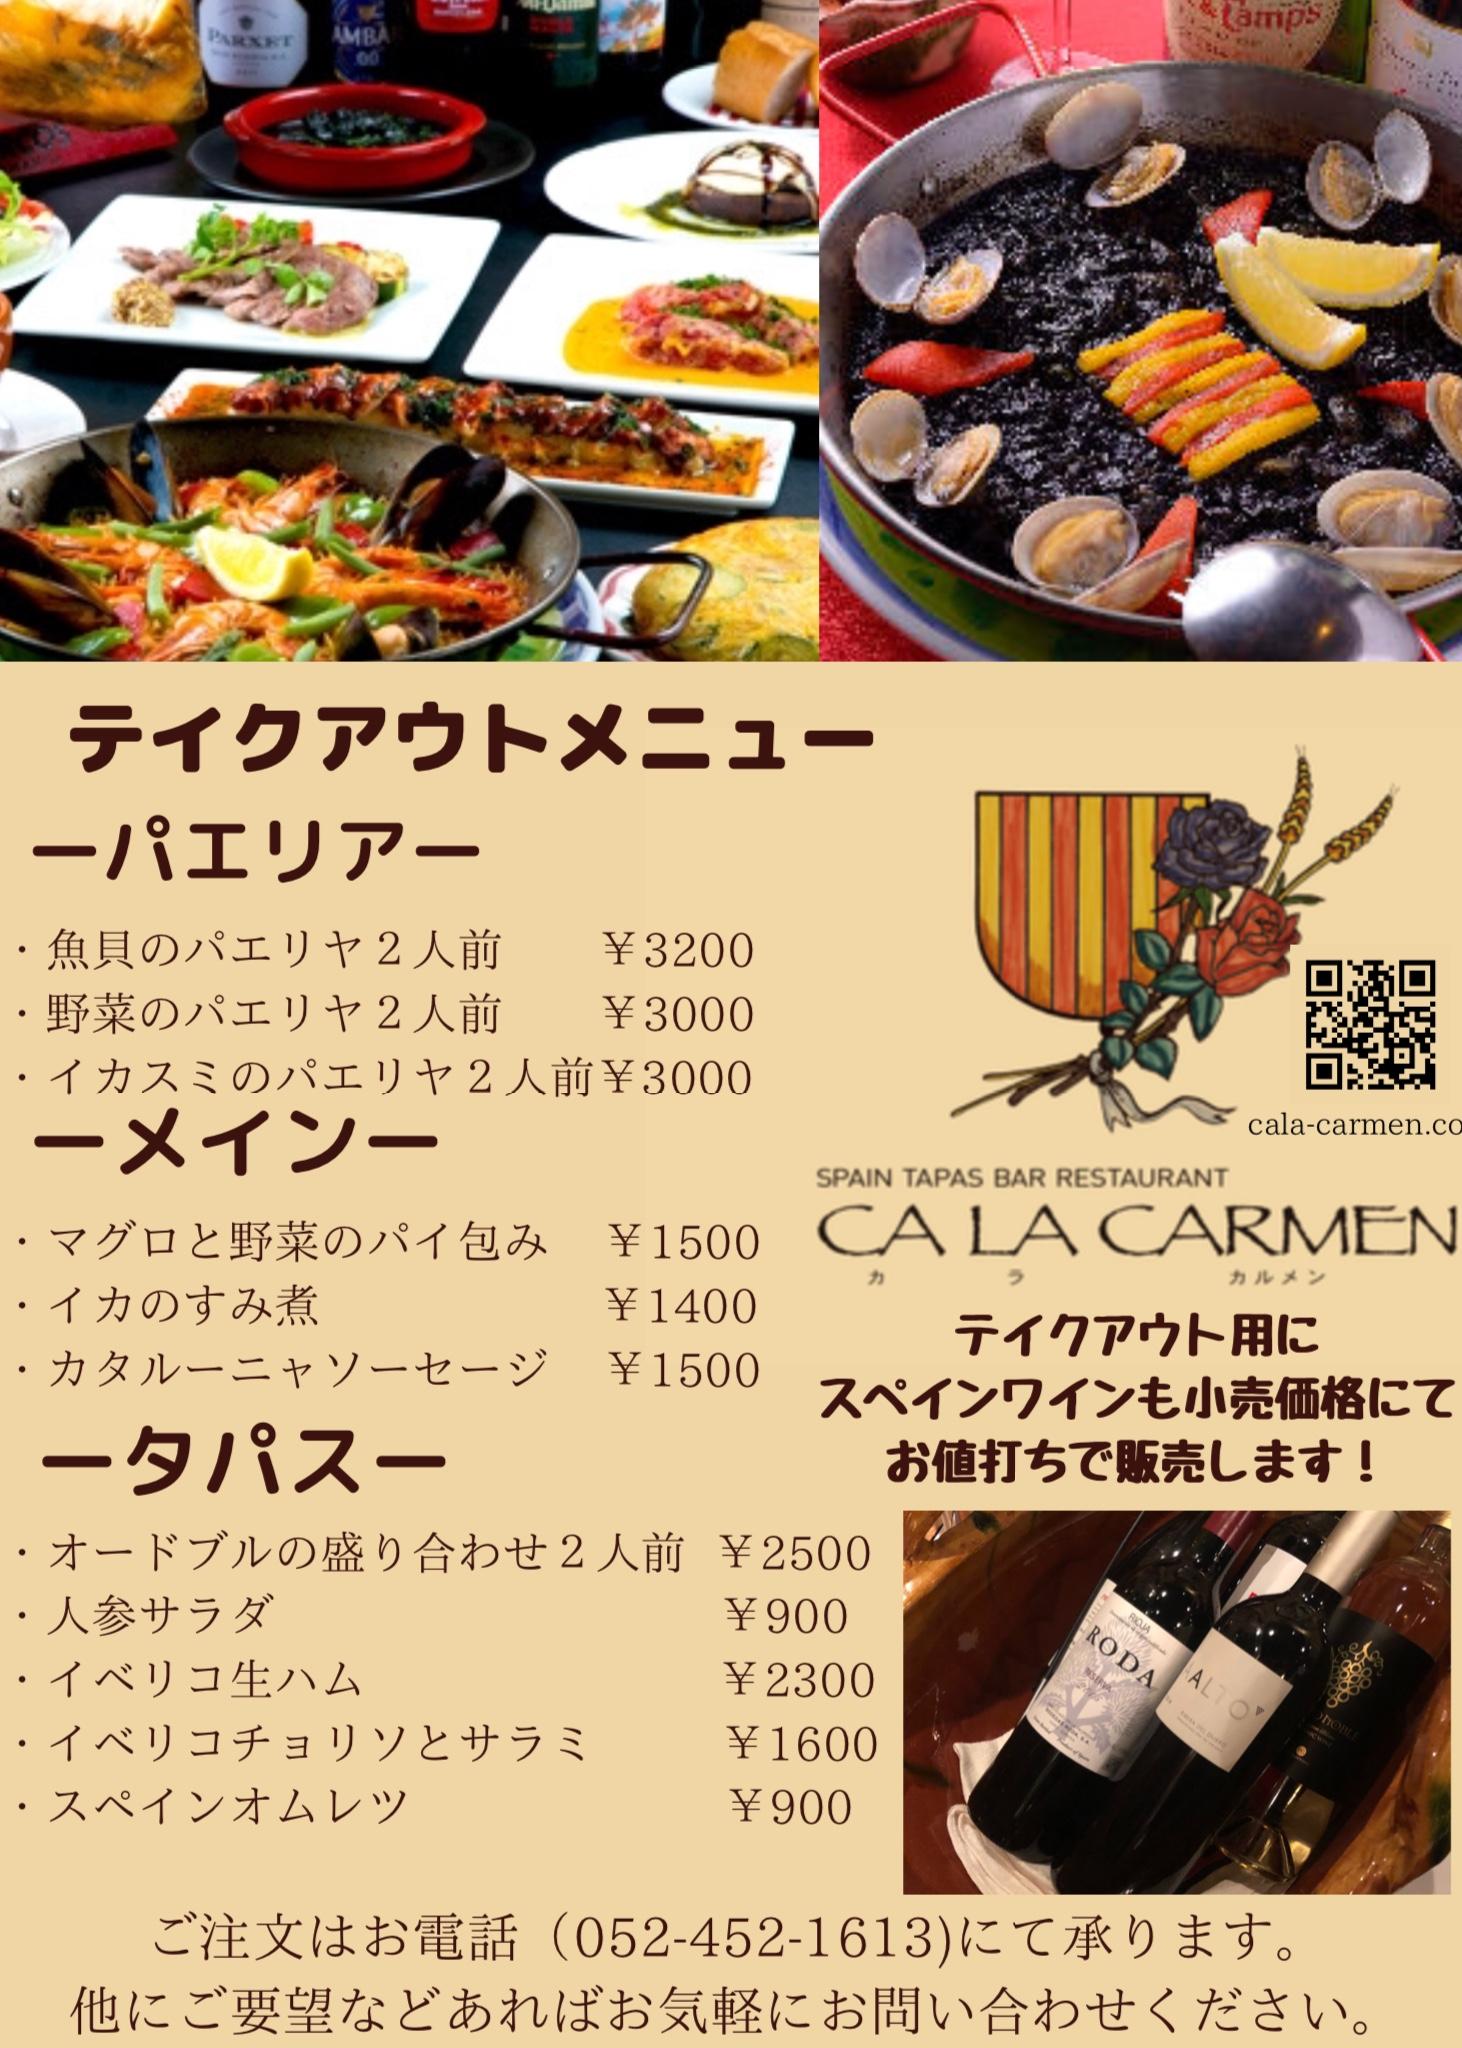 https://cala-carmen.com/_img/ja/article/453/image/